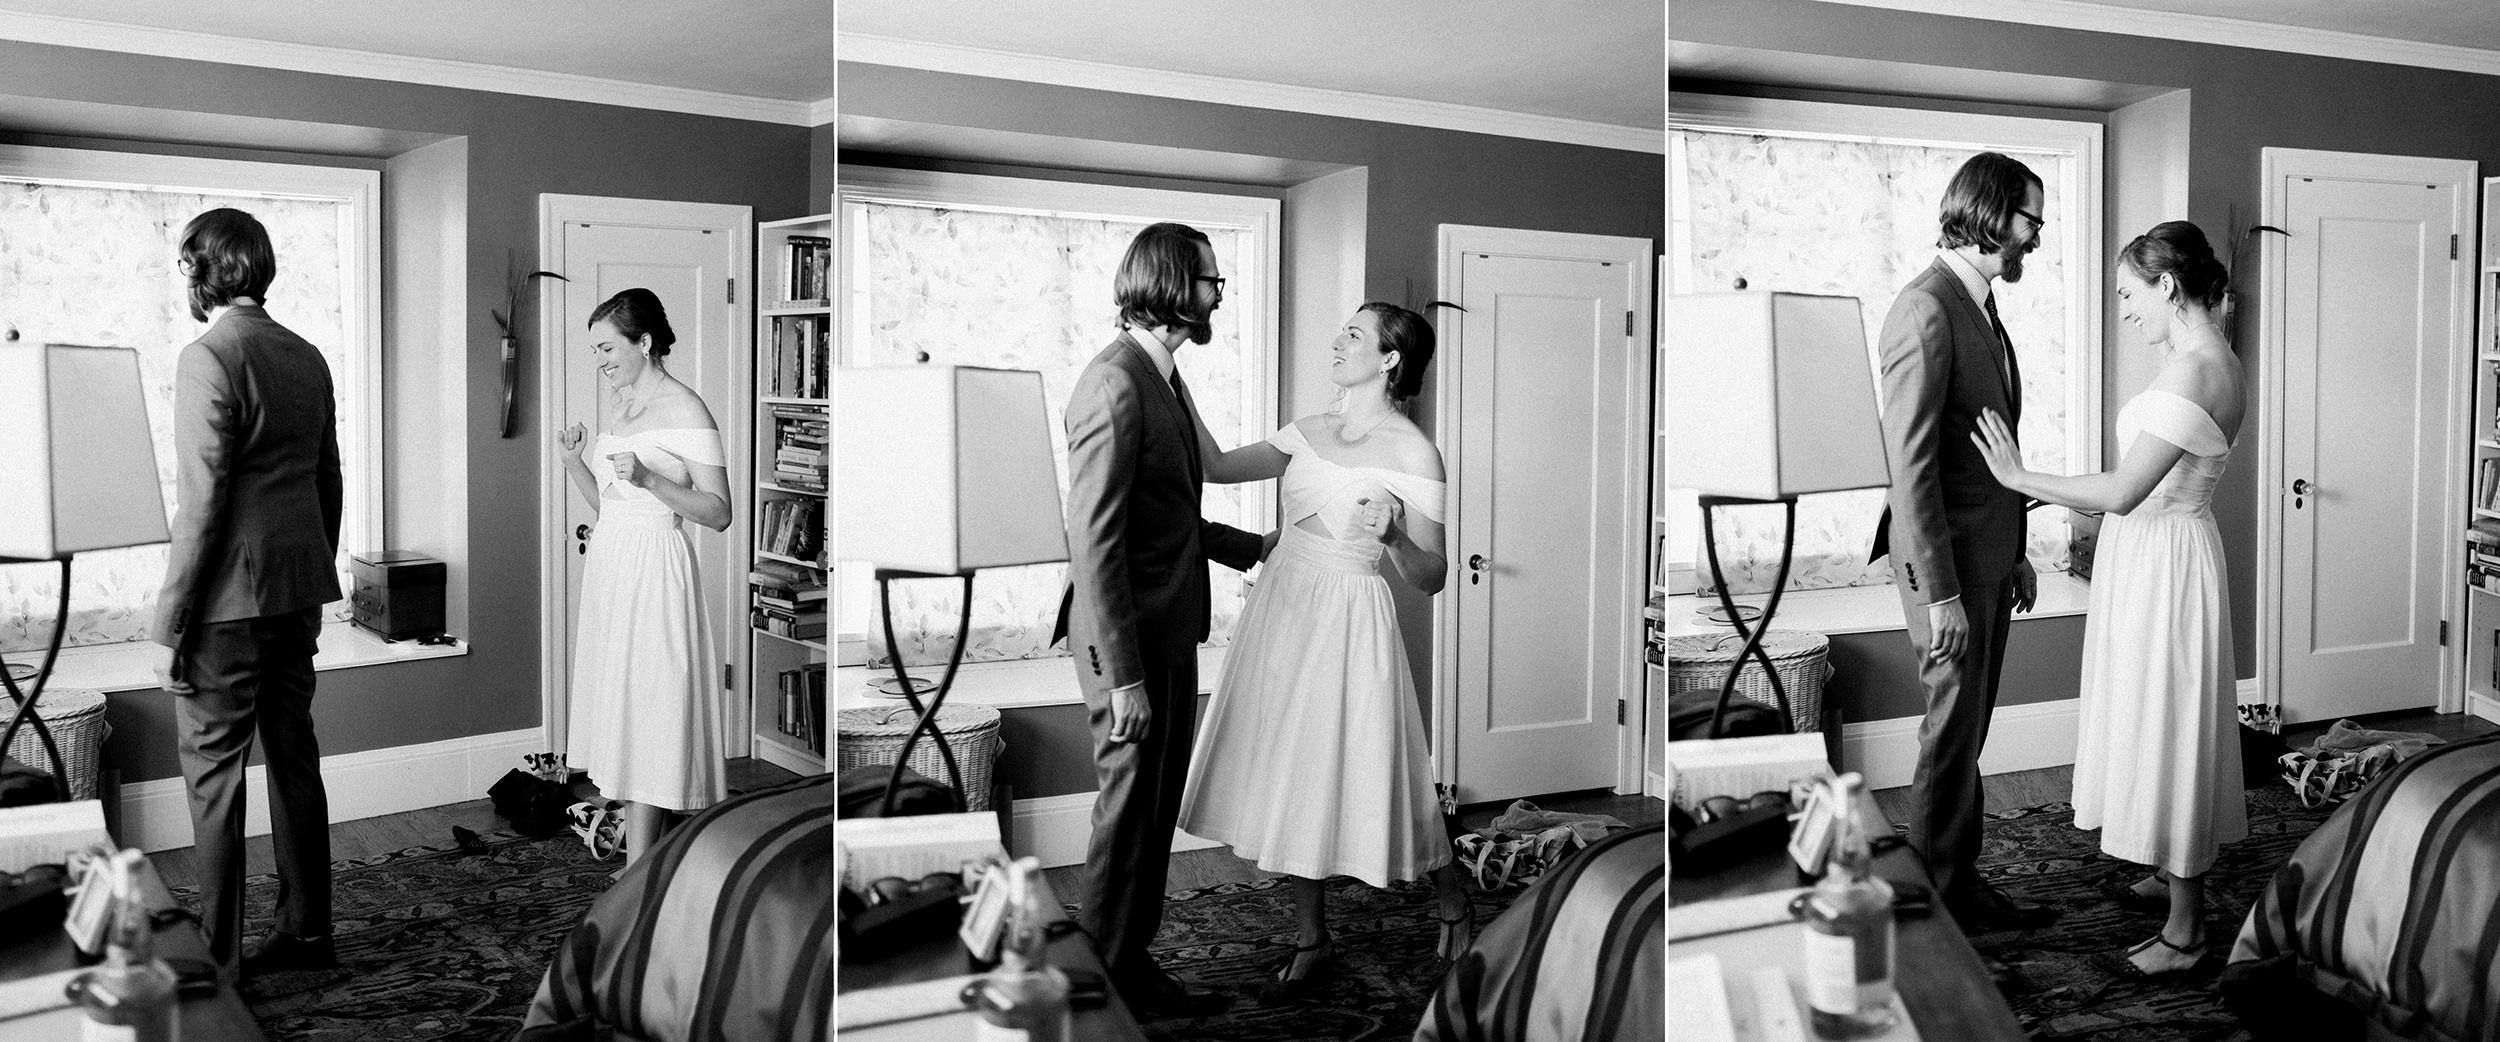 Piedmont Backyard Wedding 018.jpg